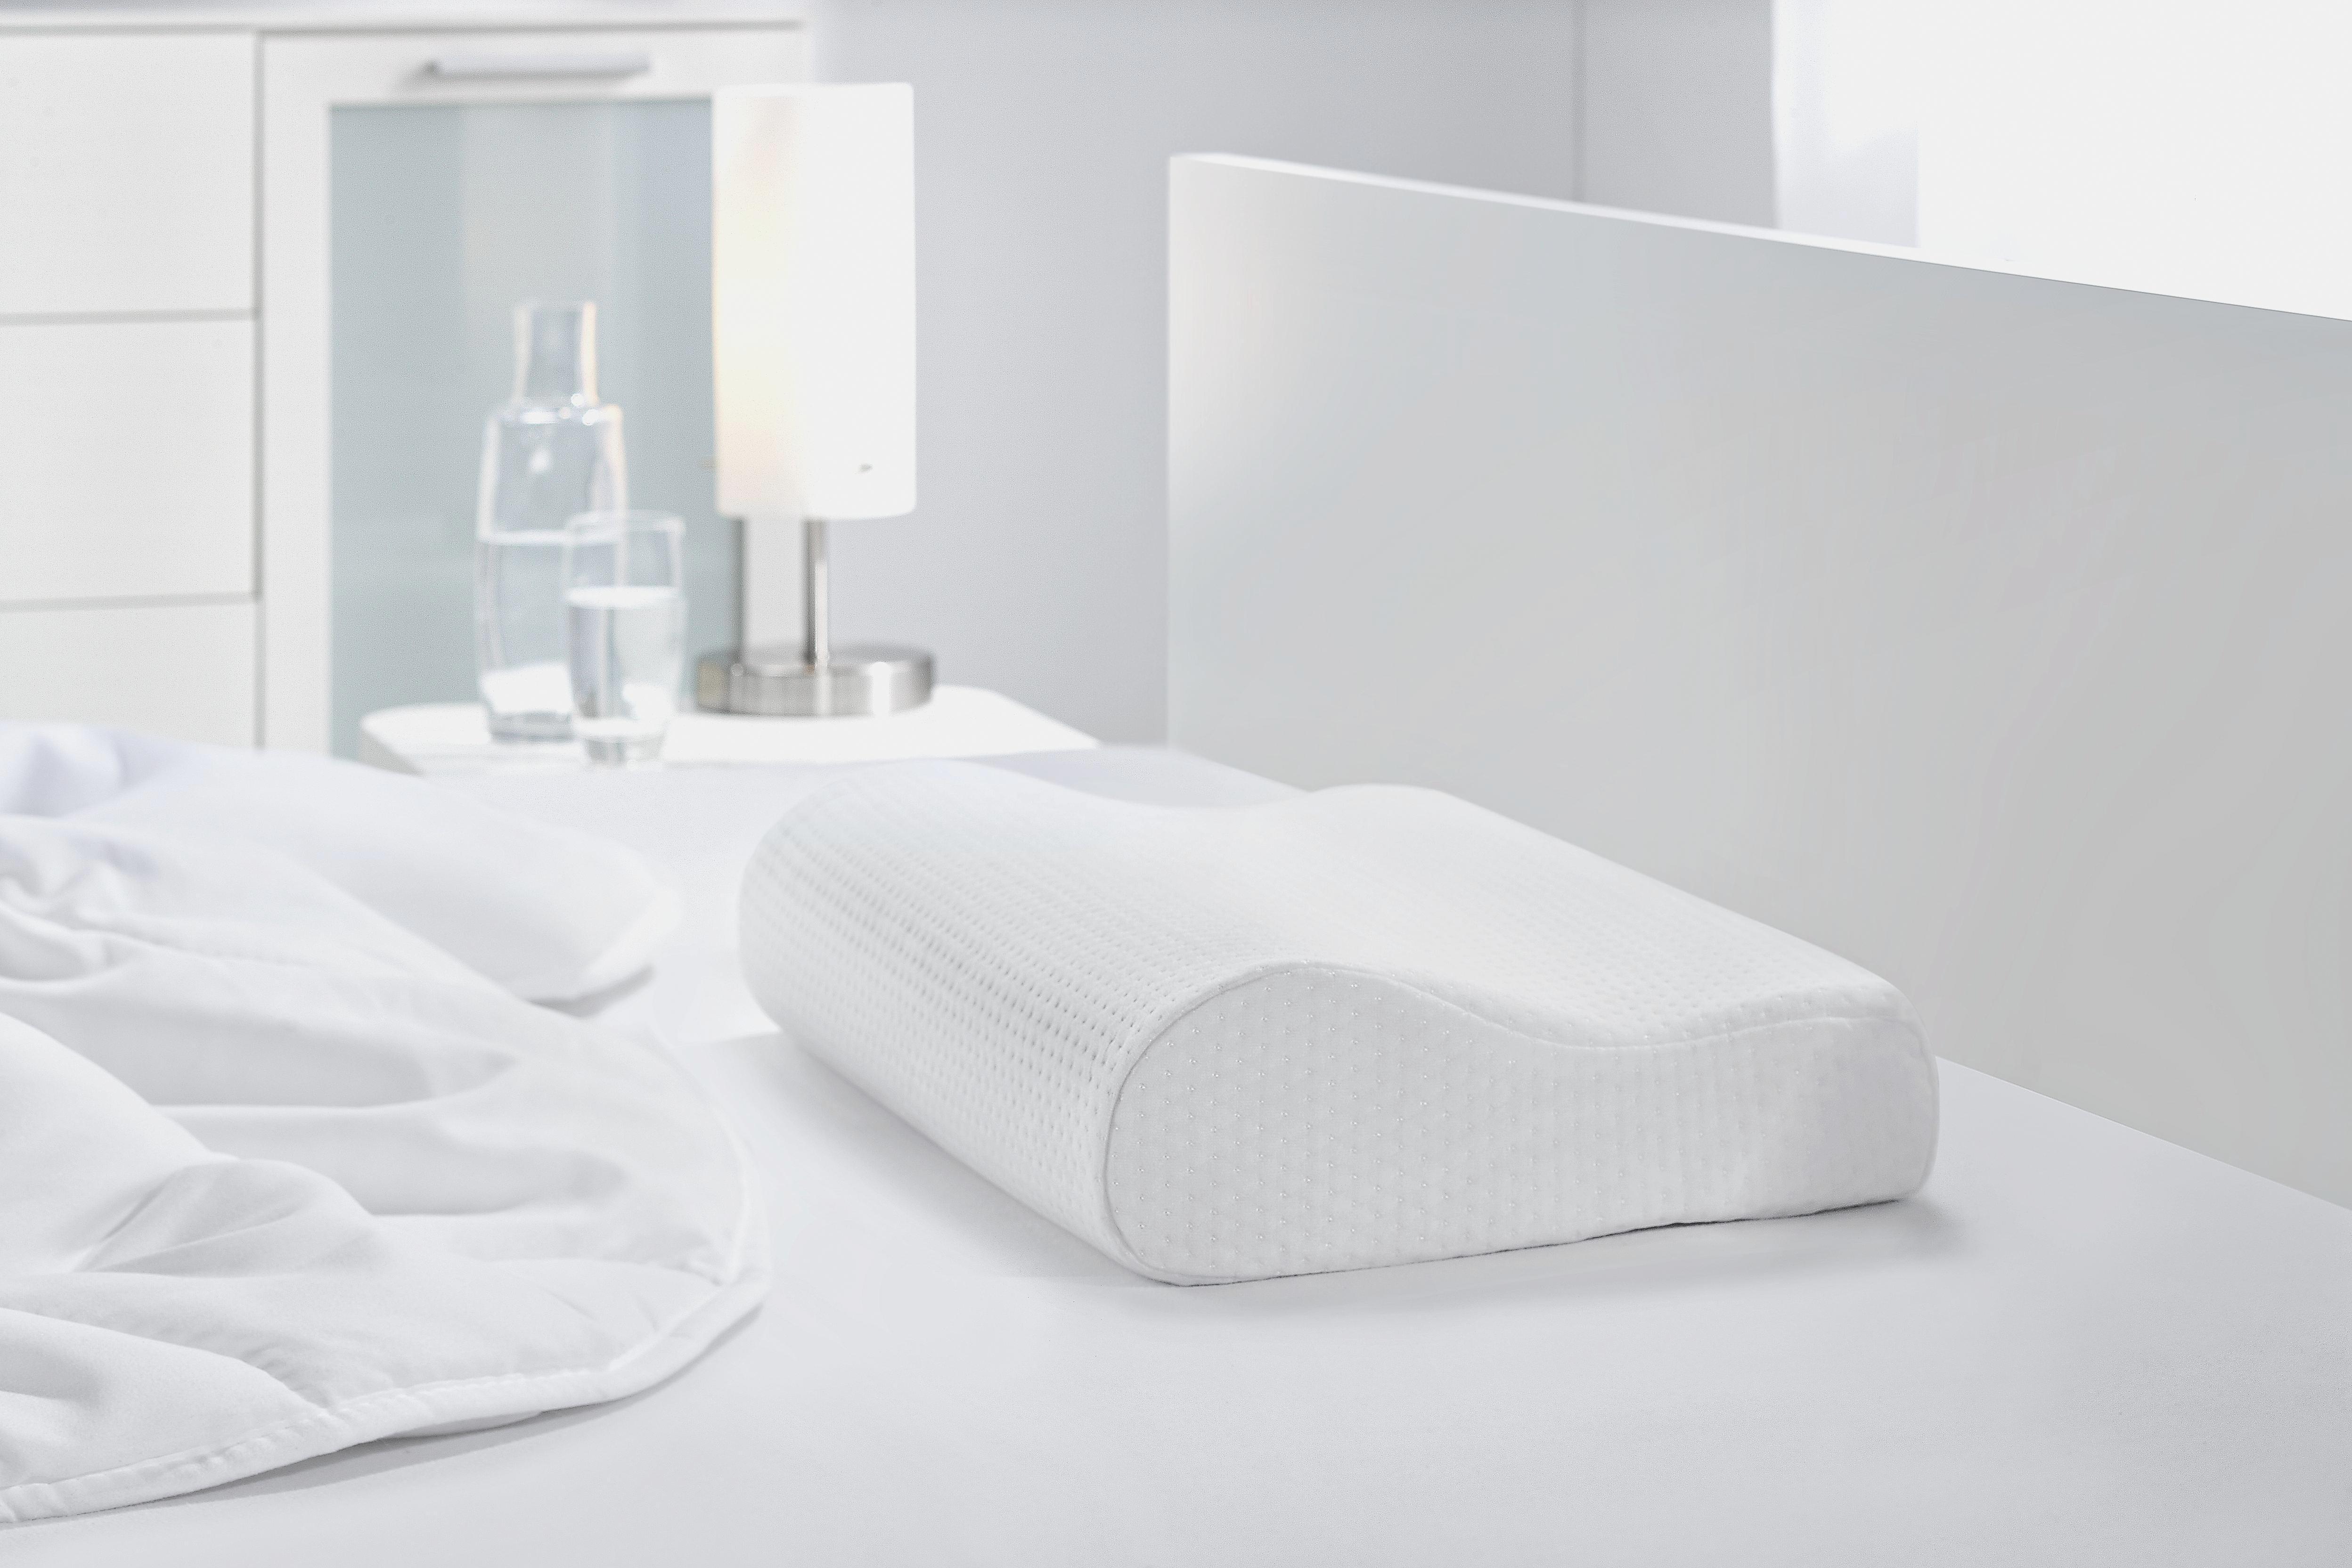 Záhlavový Vankúš Visco Comfort - biela, textil (30/48/11cm) - MÖMAX modern living